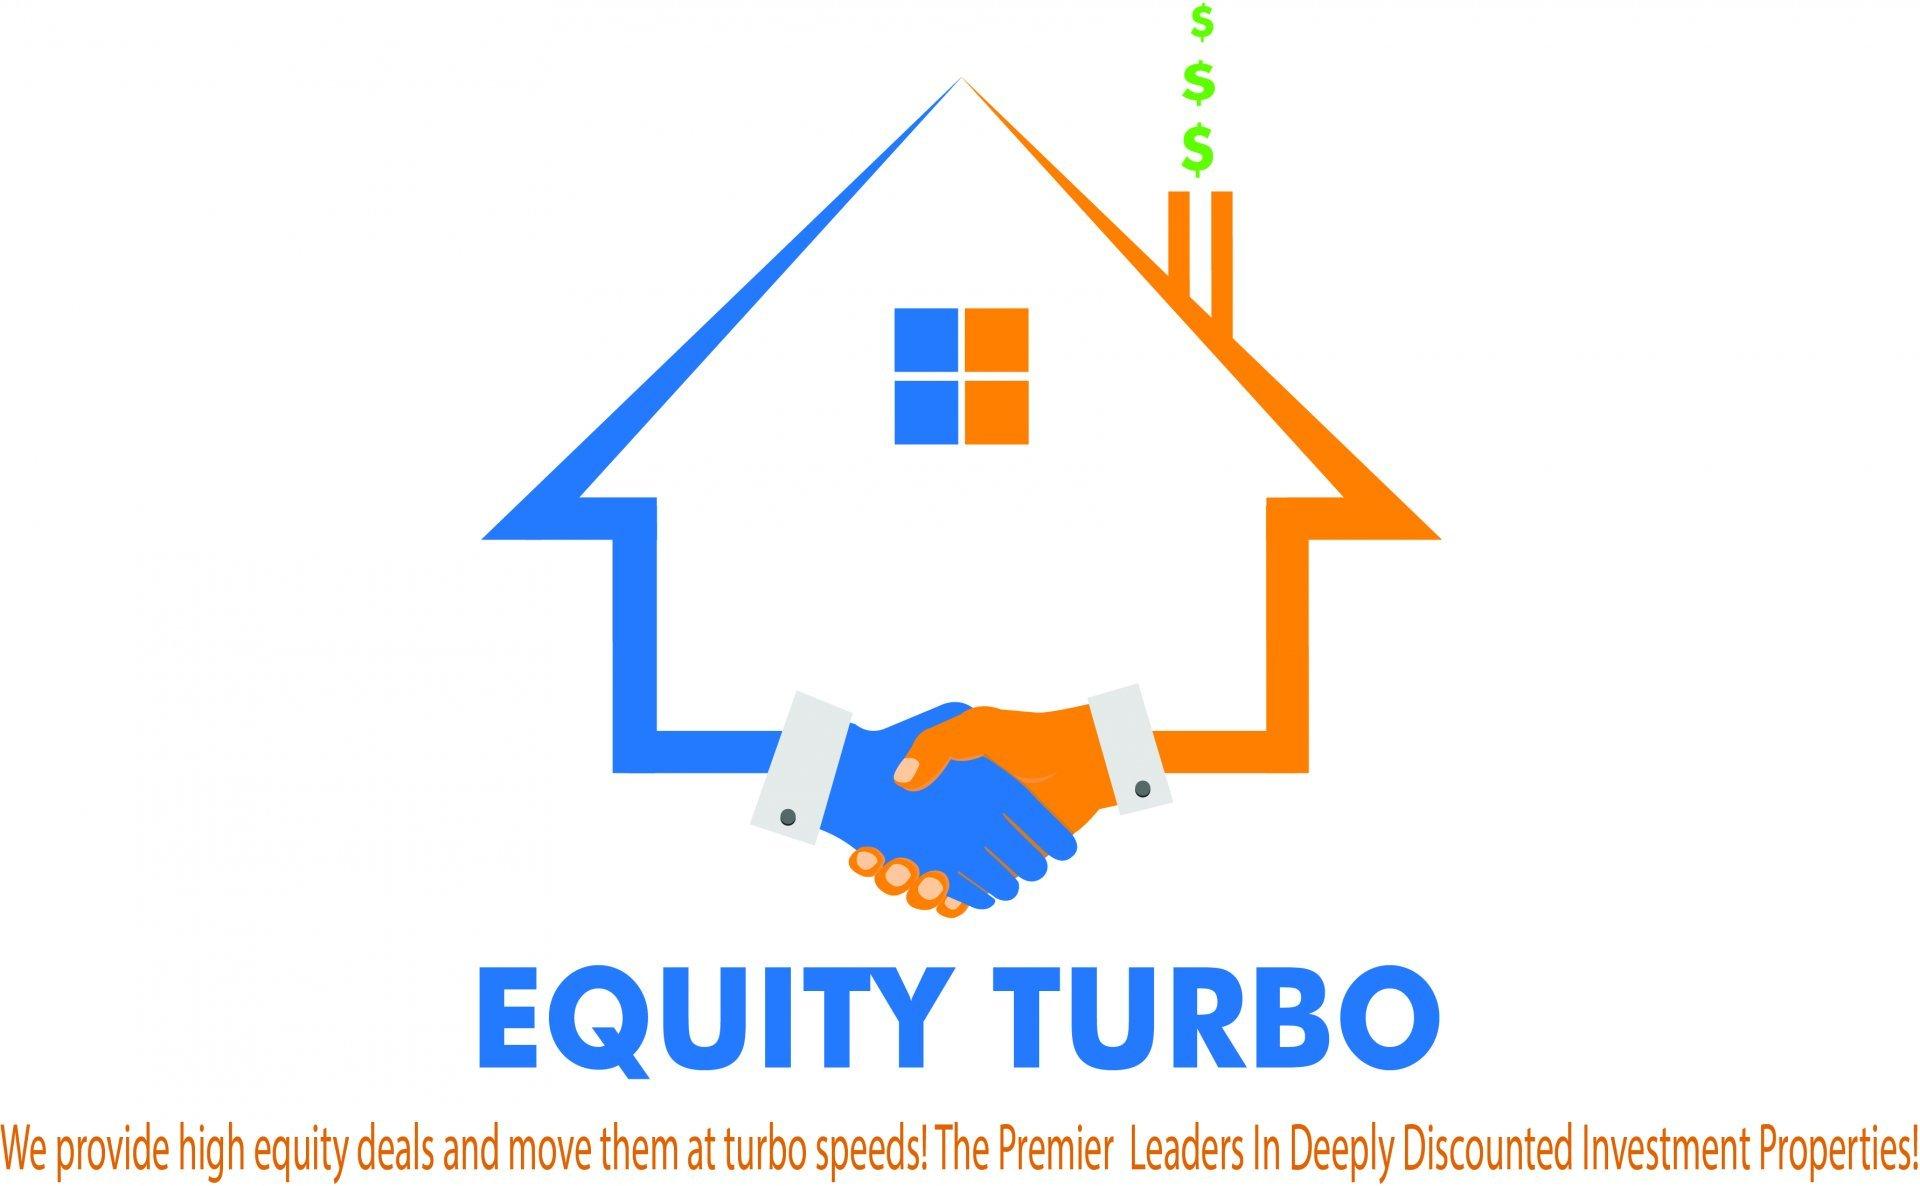 Equity Turbo logo